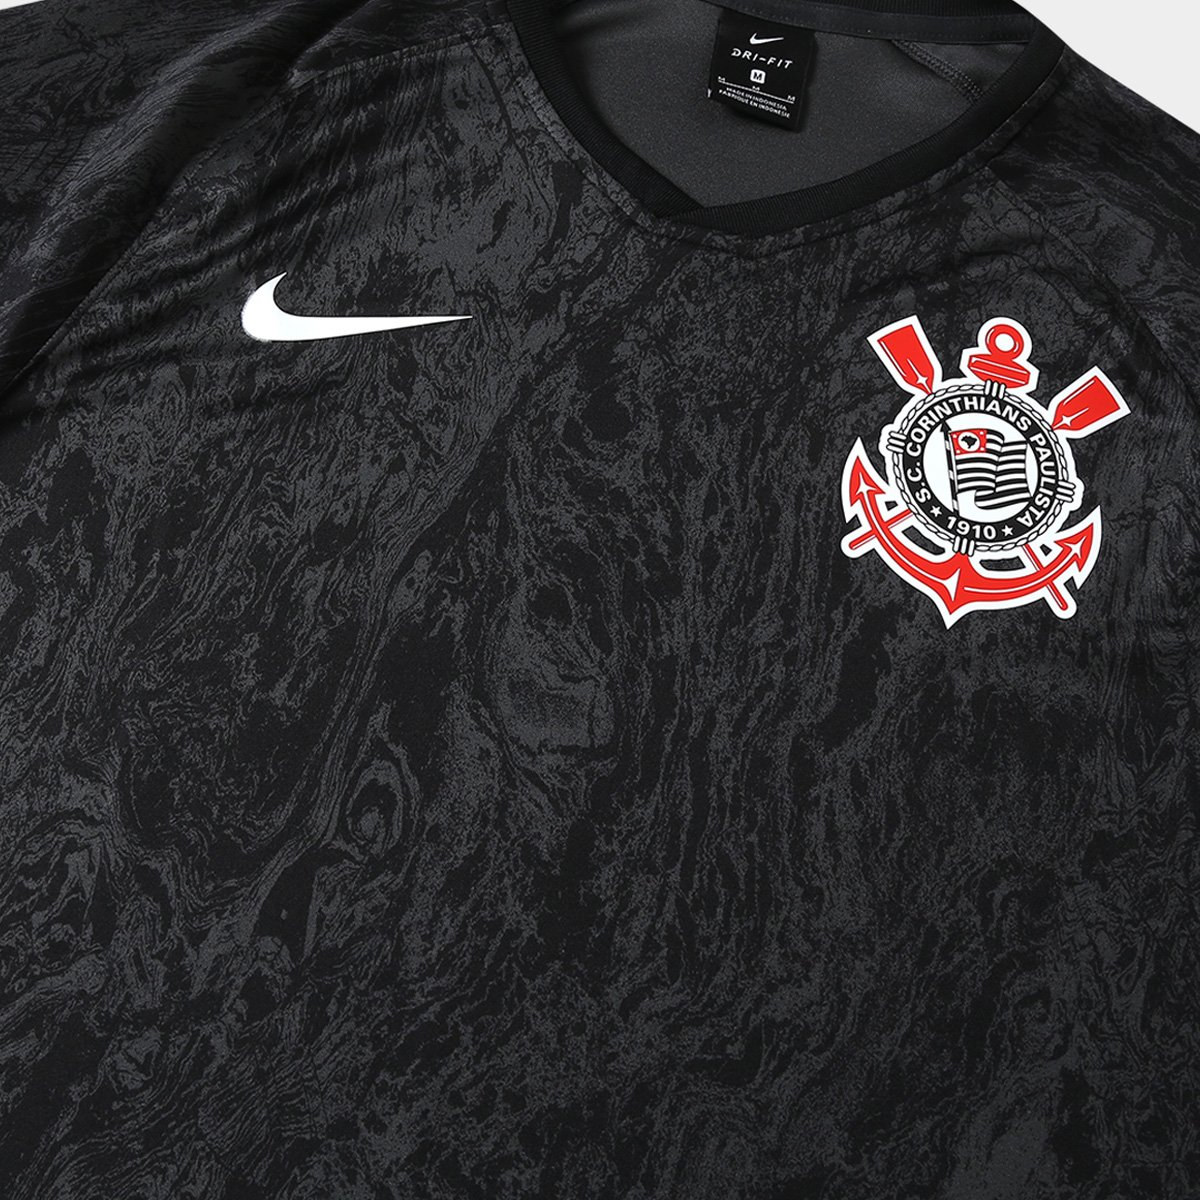 cef7fb6e66 Camisa Corinthians II 2018 s n° - Torcedor Estádio Nike Masculina ...